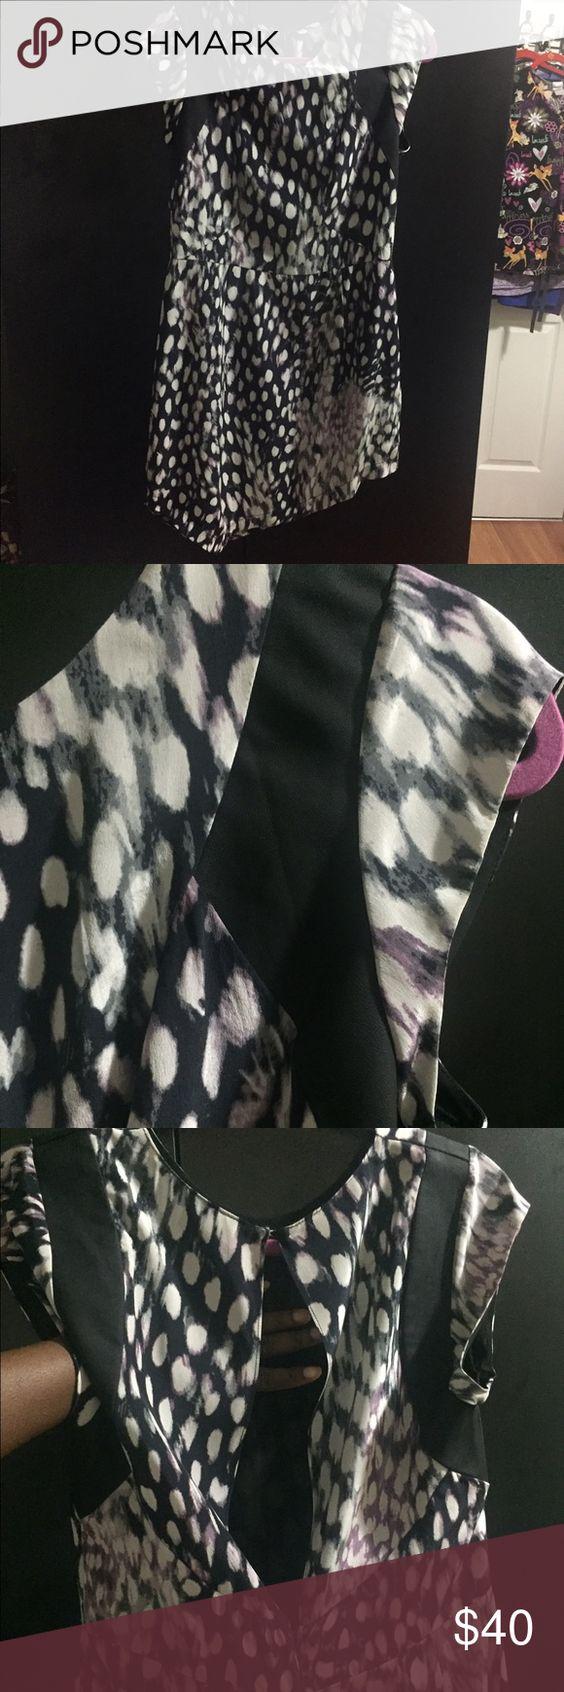 Midi dress MIDI dress with asymmetric bottom and see through back. Very unusual and cute. Neiman Marcus Dresses Midi